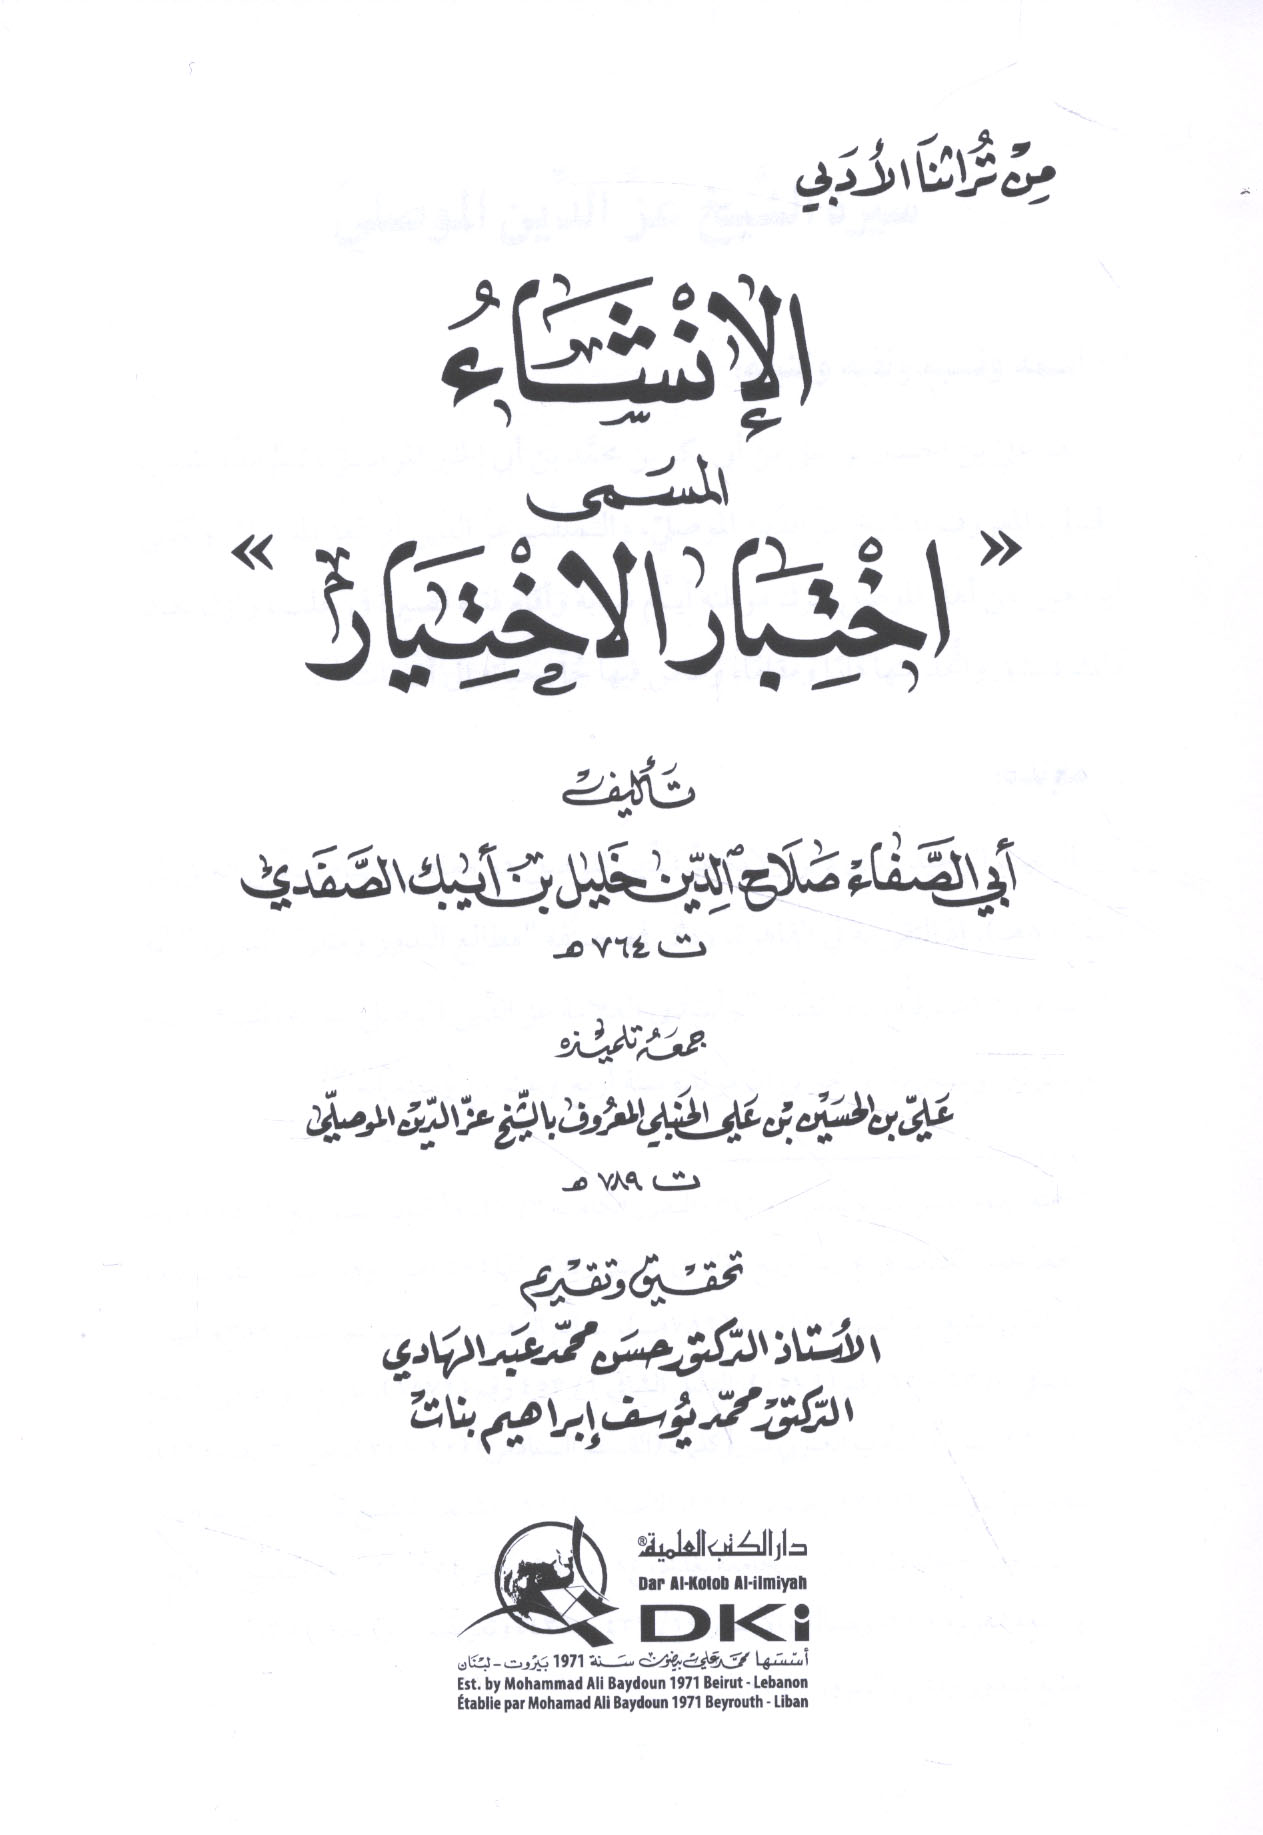 Insha al-musamma Ikhtibar al-ikhtiyar